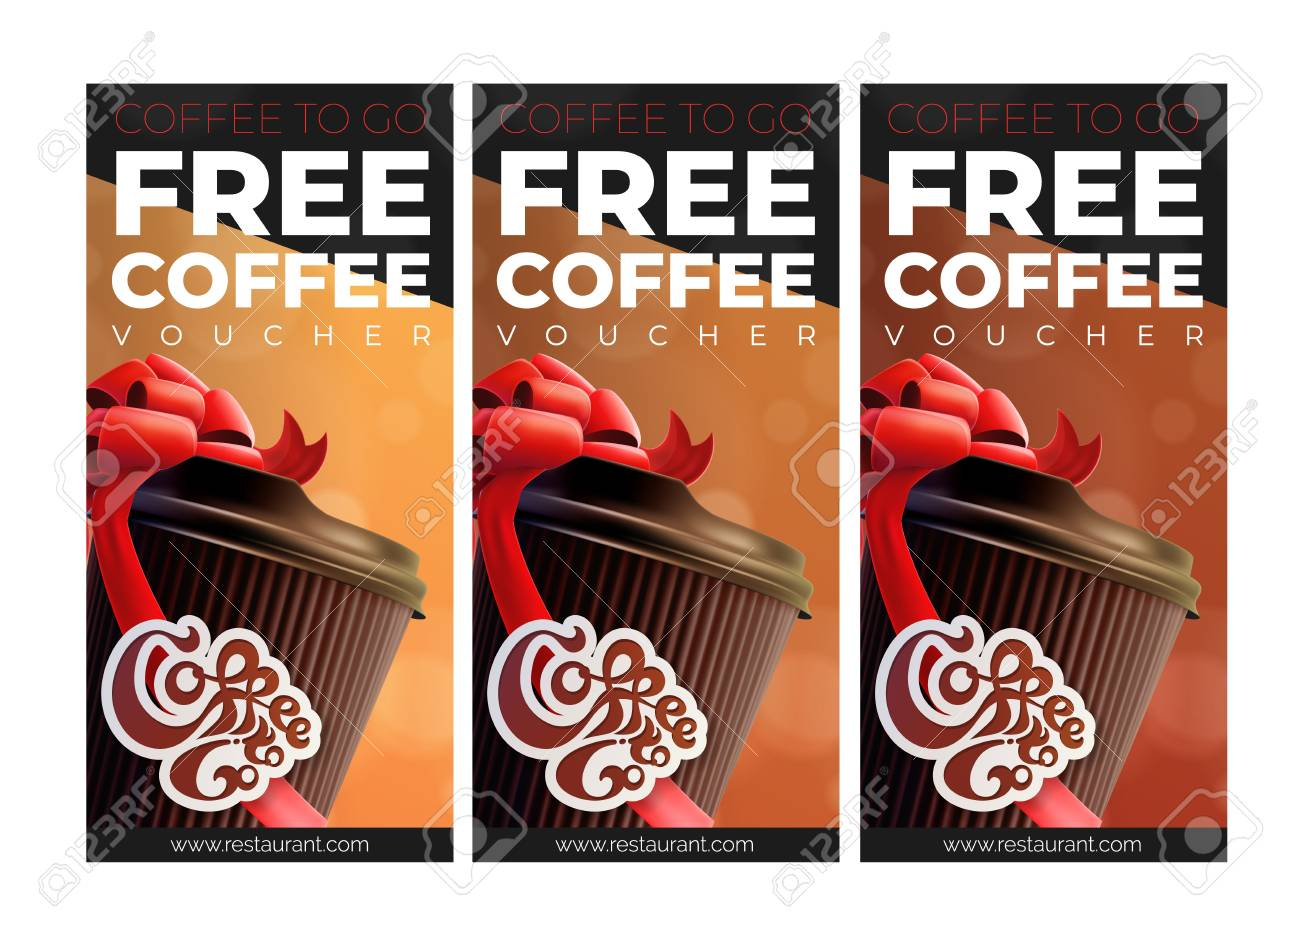 photo regarding Printable Versions called Espresso Towards Transfer Printable No cost Espresso Vouchers models.